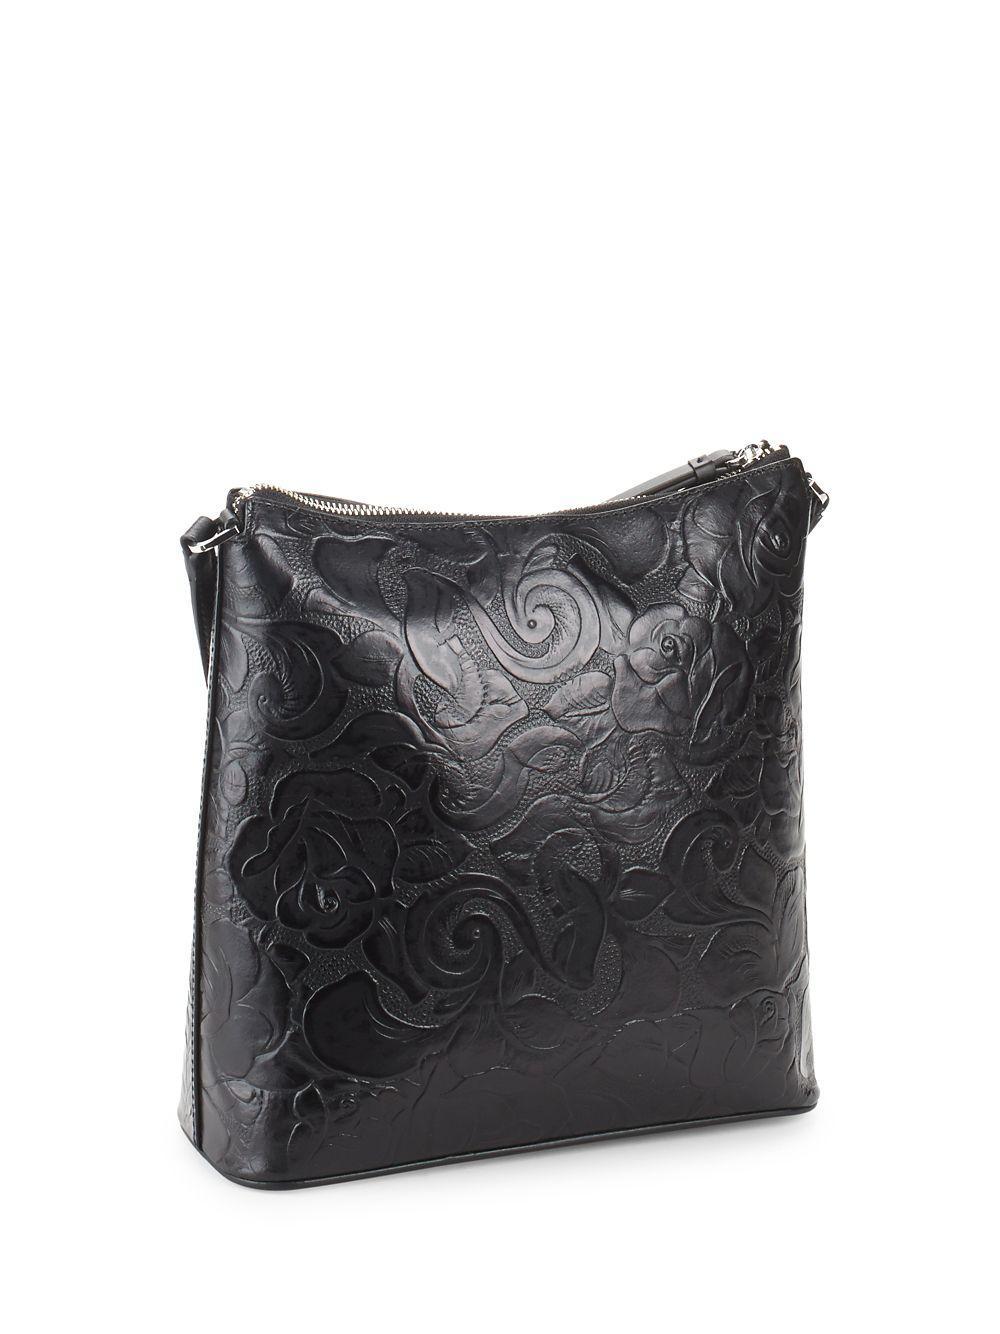 f292ed6f94 Calvin Klein Mara Floral-embossed Leather Crossbody Bag in Black - Lyst